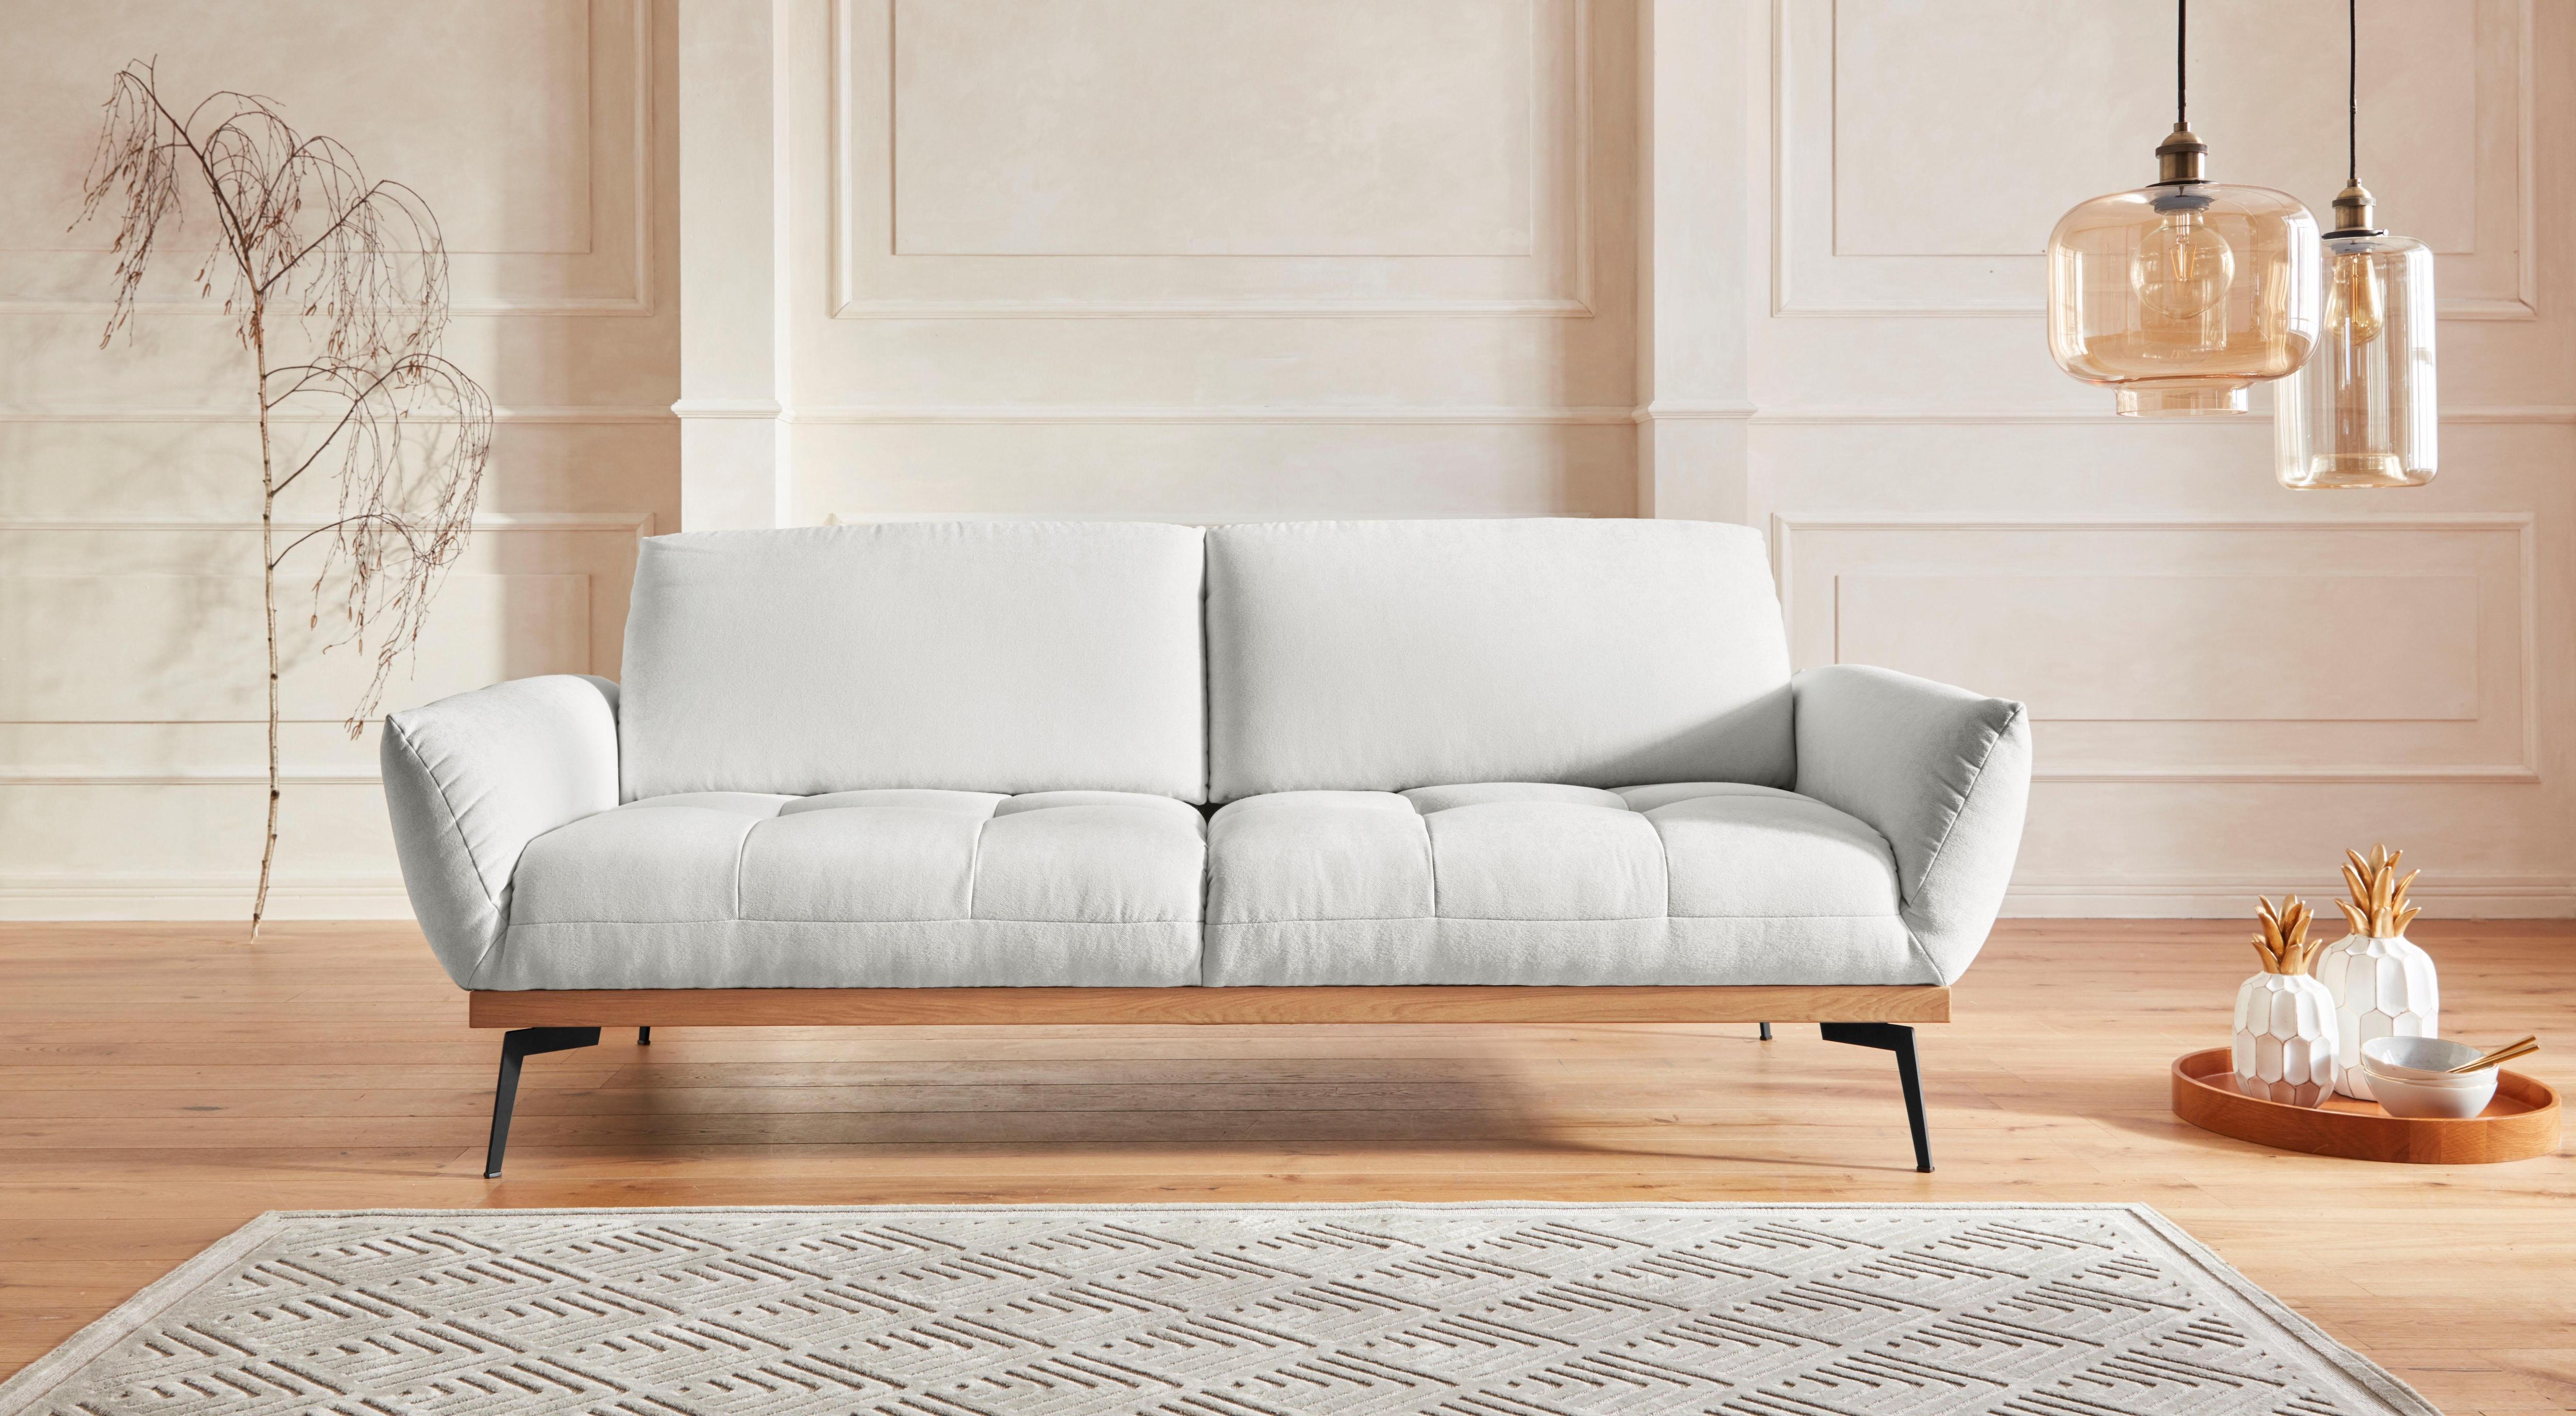 GMK Home & Living 3-Sitzer